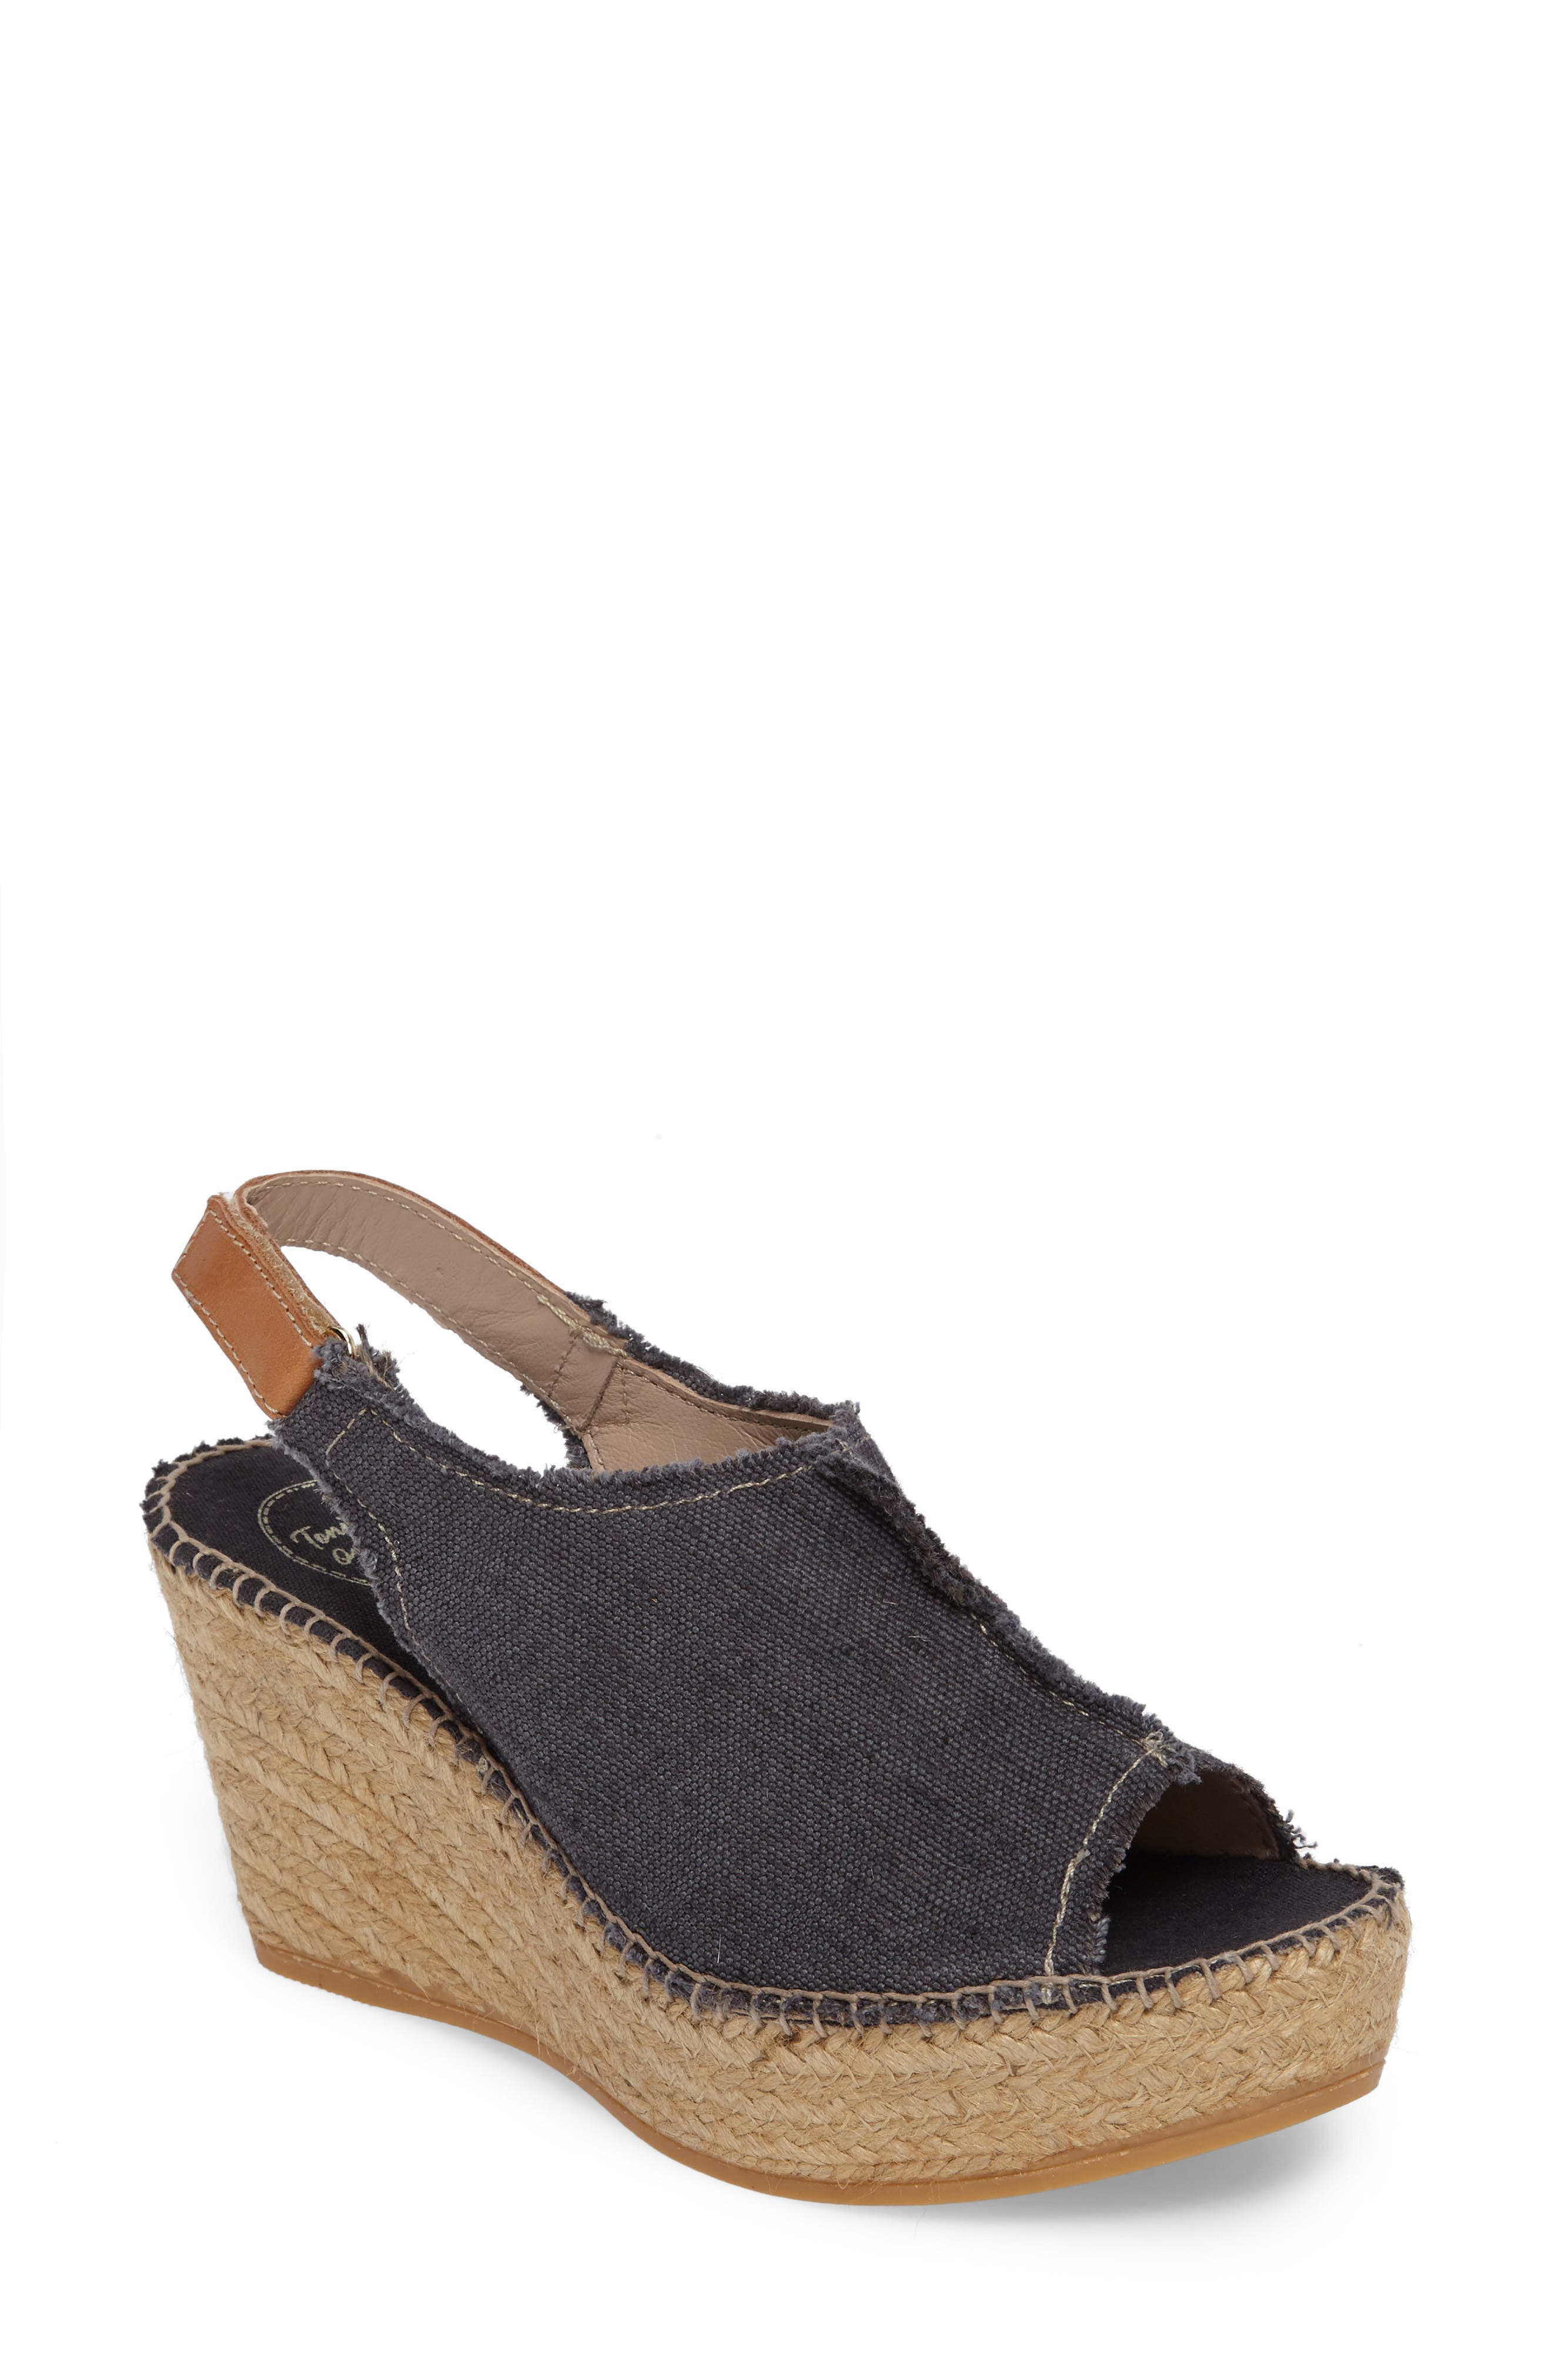 'Lugano' Espadrille Wedge Sandal,                         Main,                         color, BLACK FABRIC